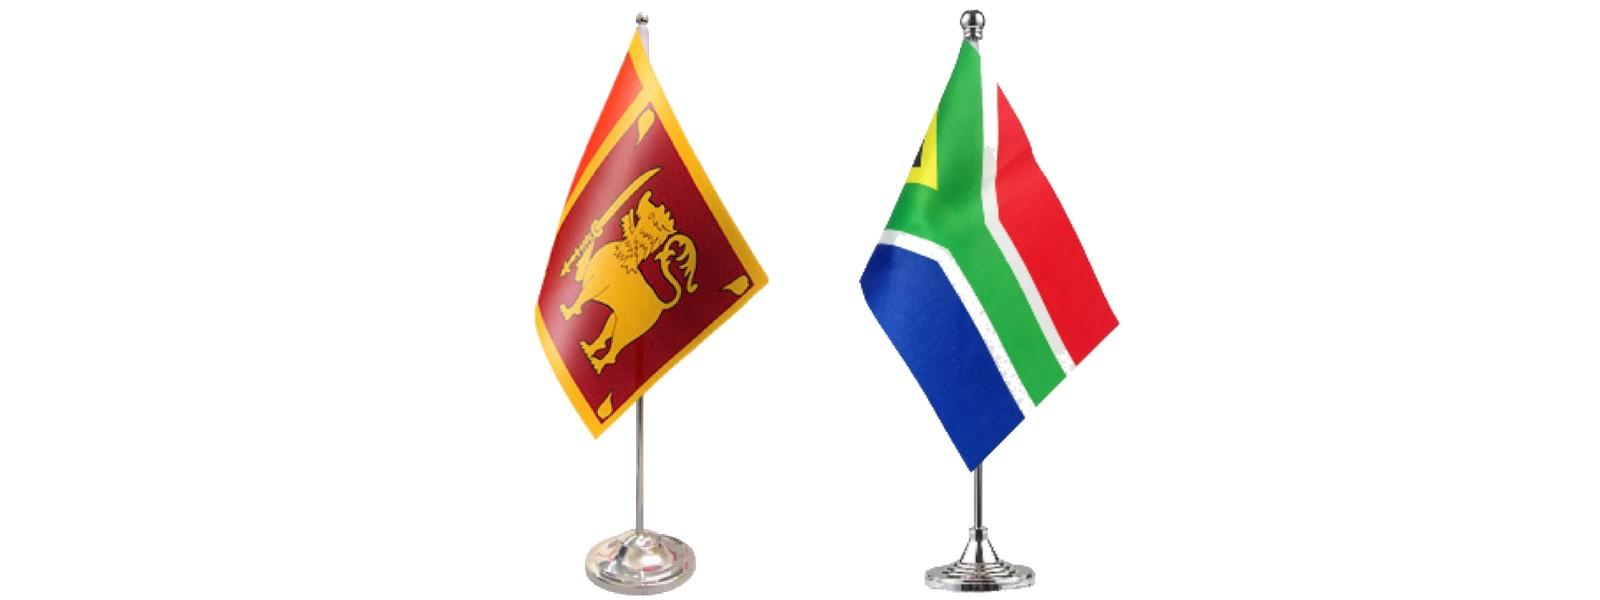 Sri Lanka & South Africa discuss reparations & post-conflict development